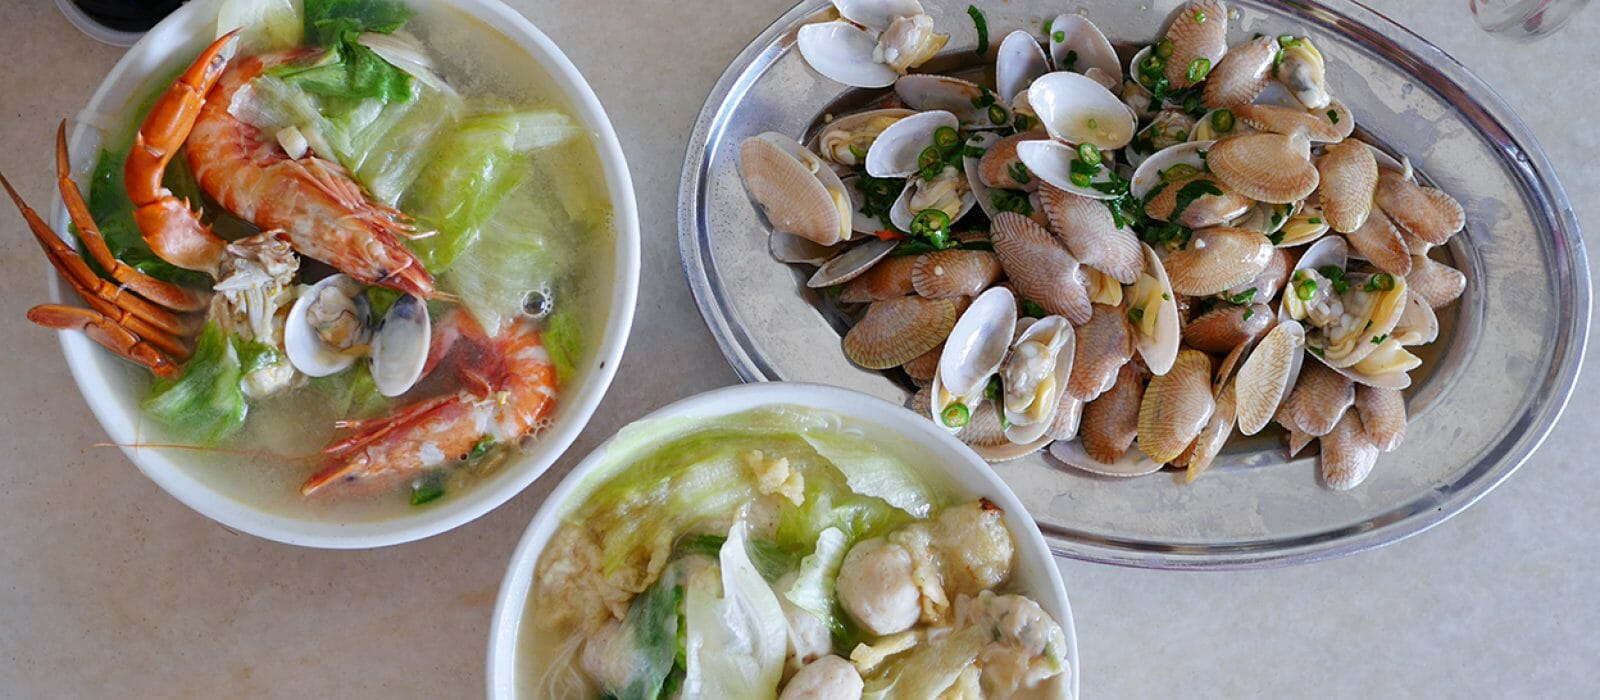 Hoong Wan Fish Noodles, Chemor